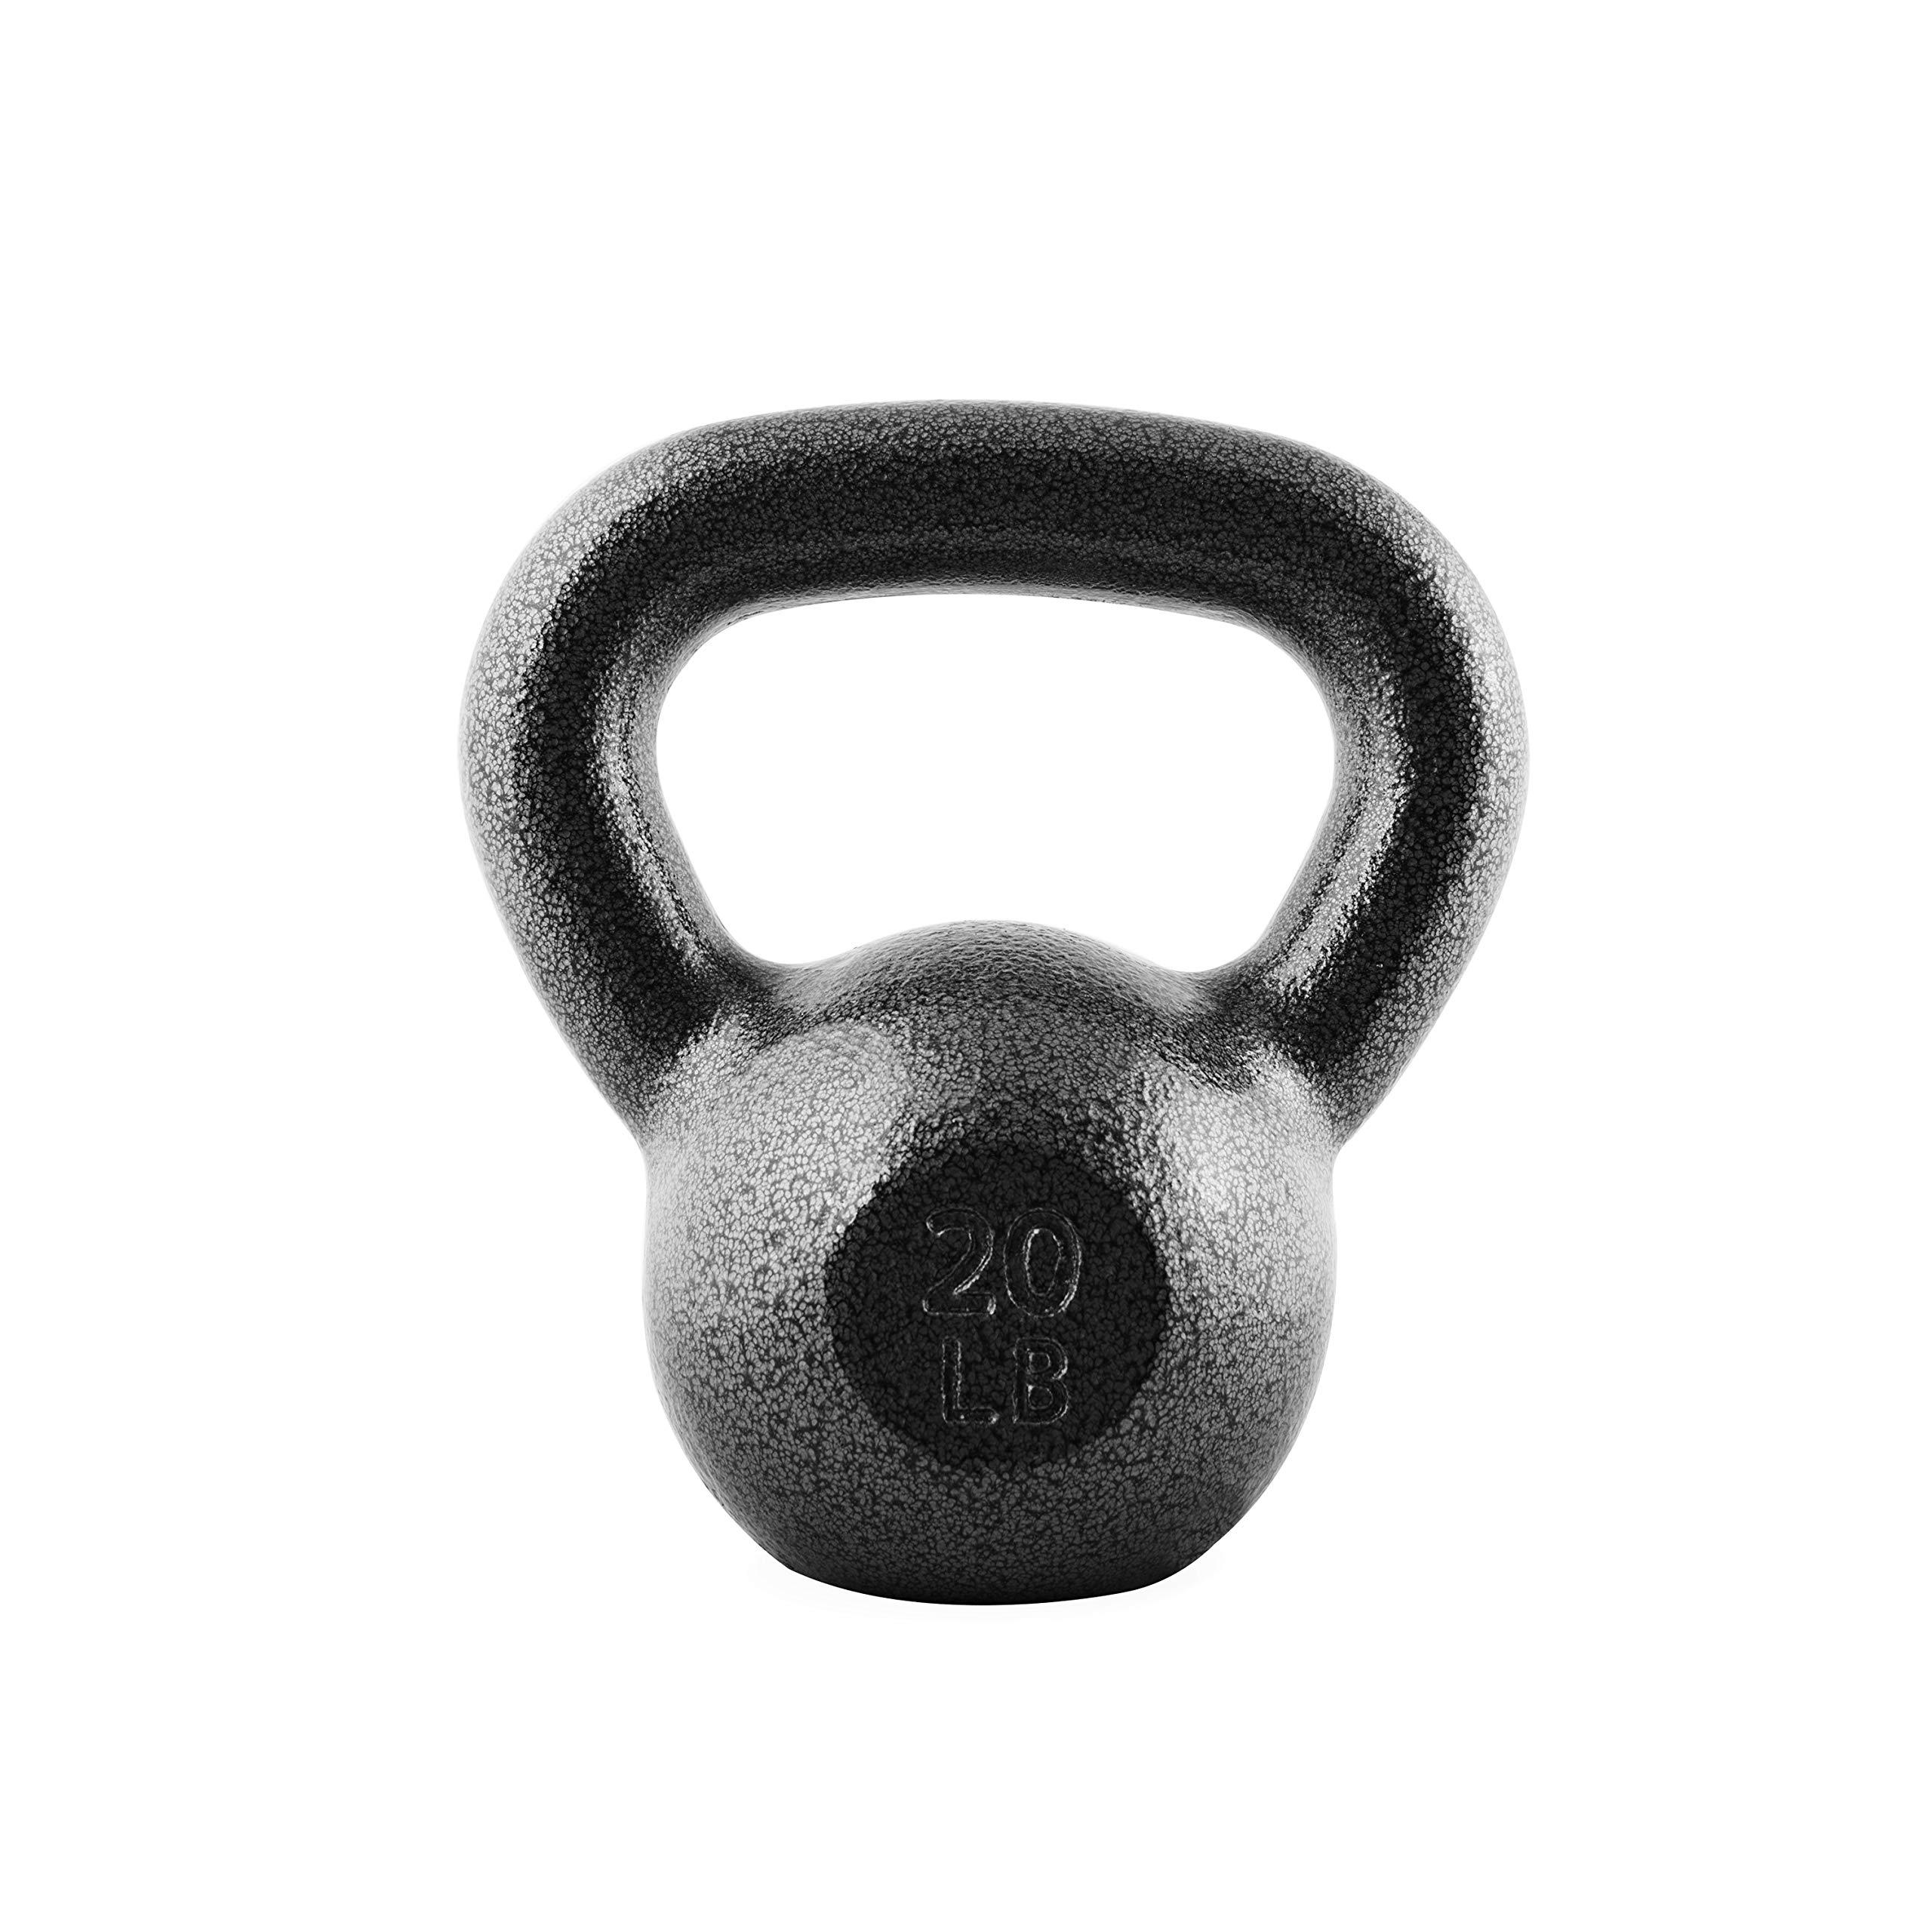 CAP Barbell SDK2B-020 Cast Iron Kettlebell, 20 lb, Black